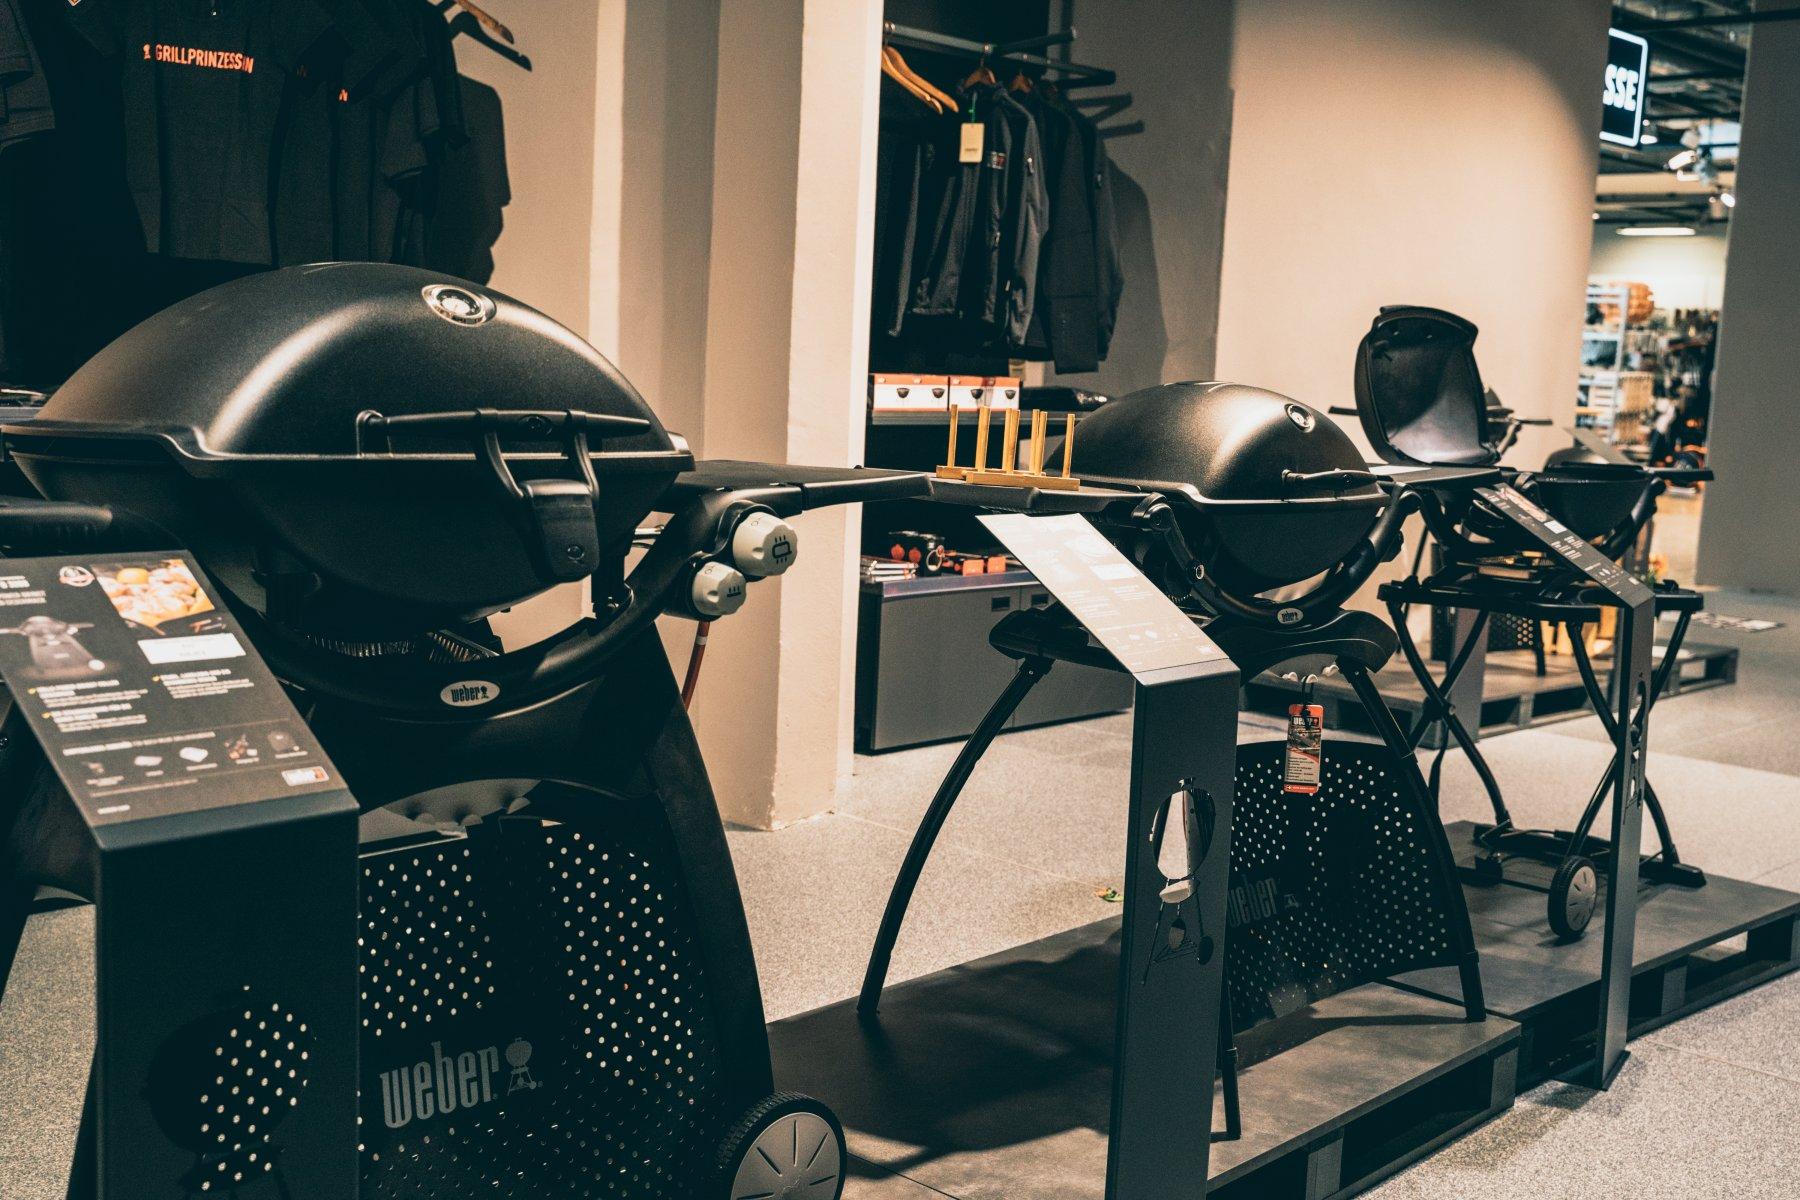 geheimtipp muenchen weber store grill09116 – ©wunderland media GmbH